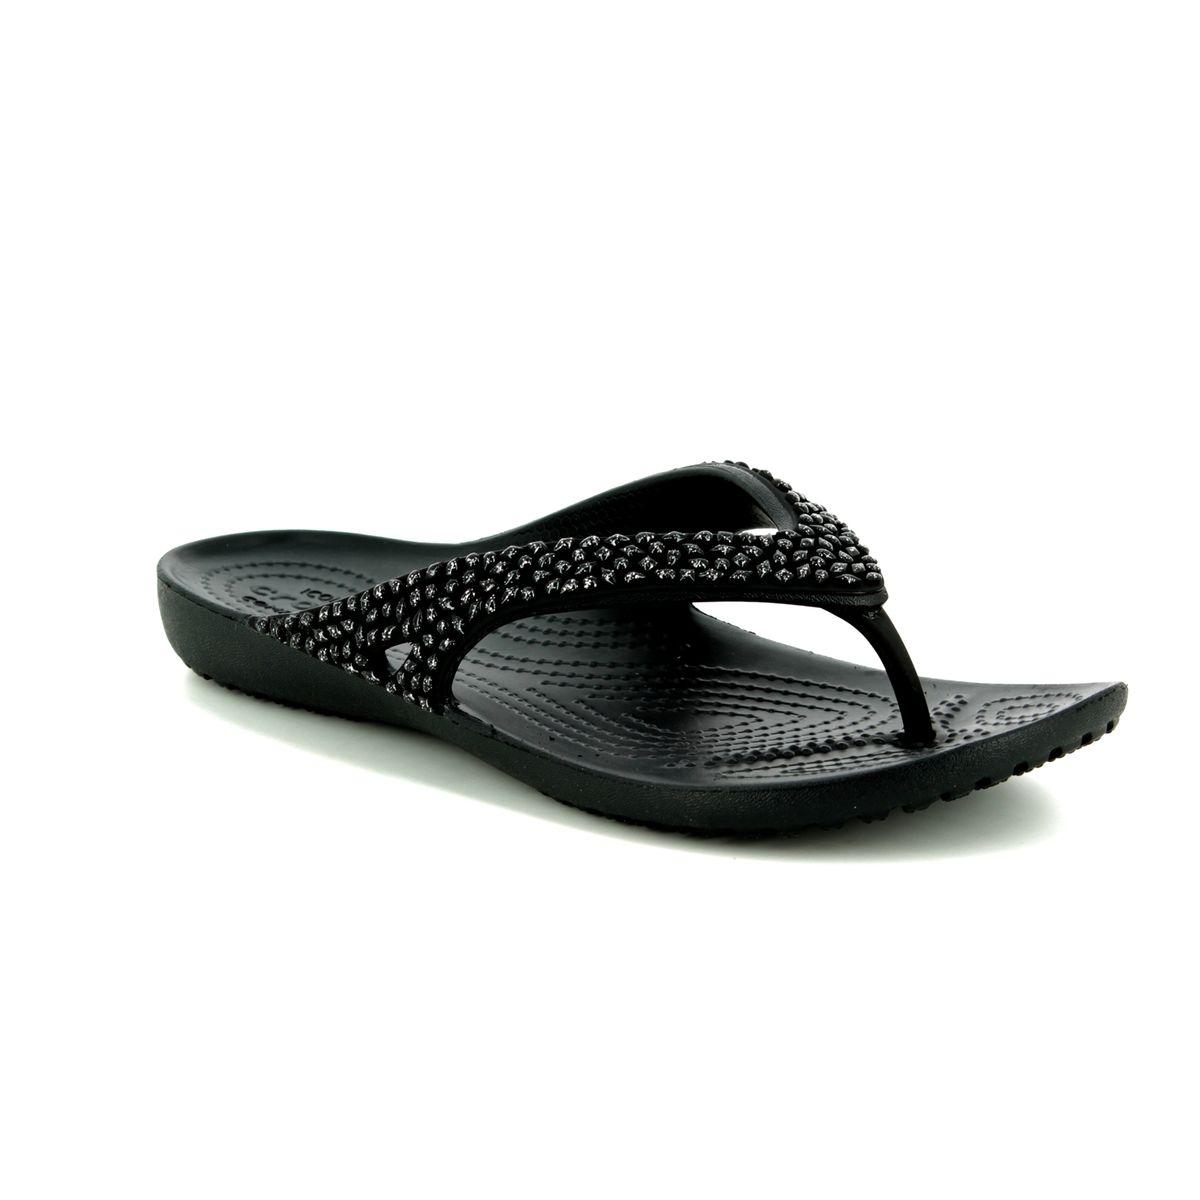 300b4dbe5 Crocs Toe Post Sandals - Black - 205741 001 KADEE 2 DIAMOND